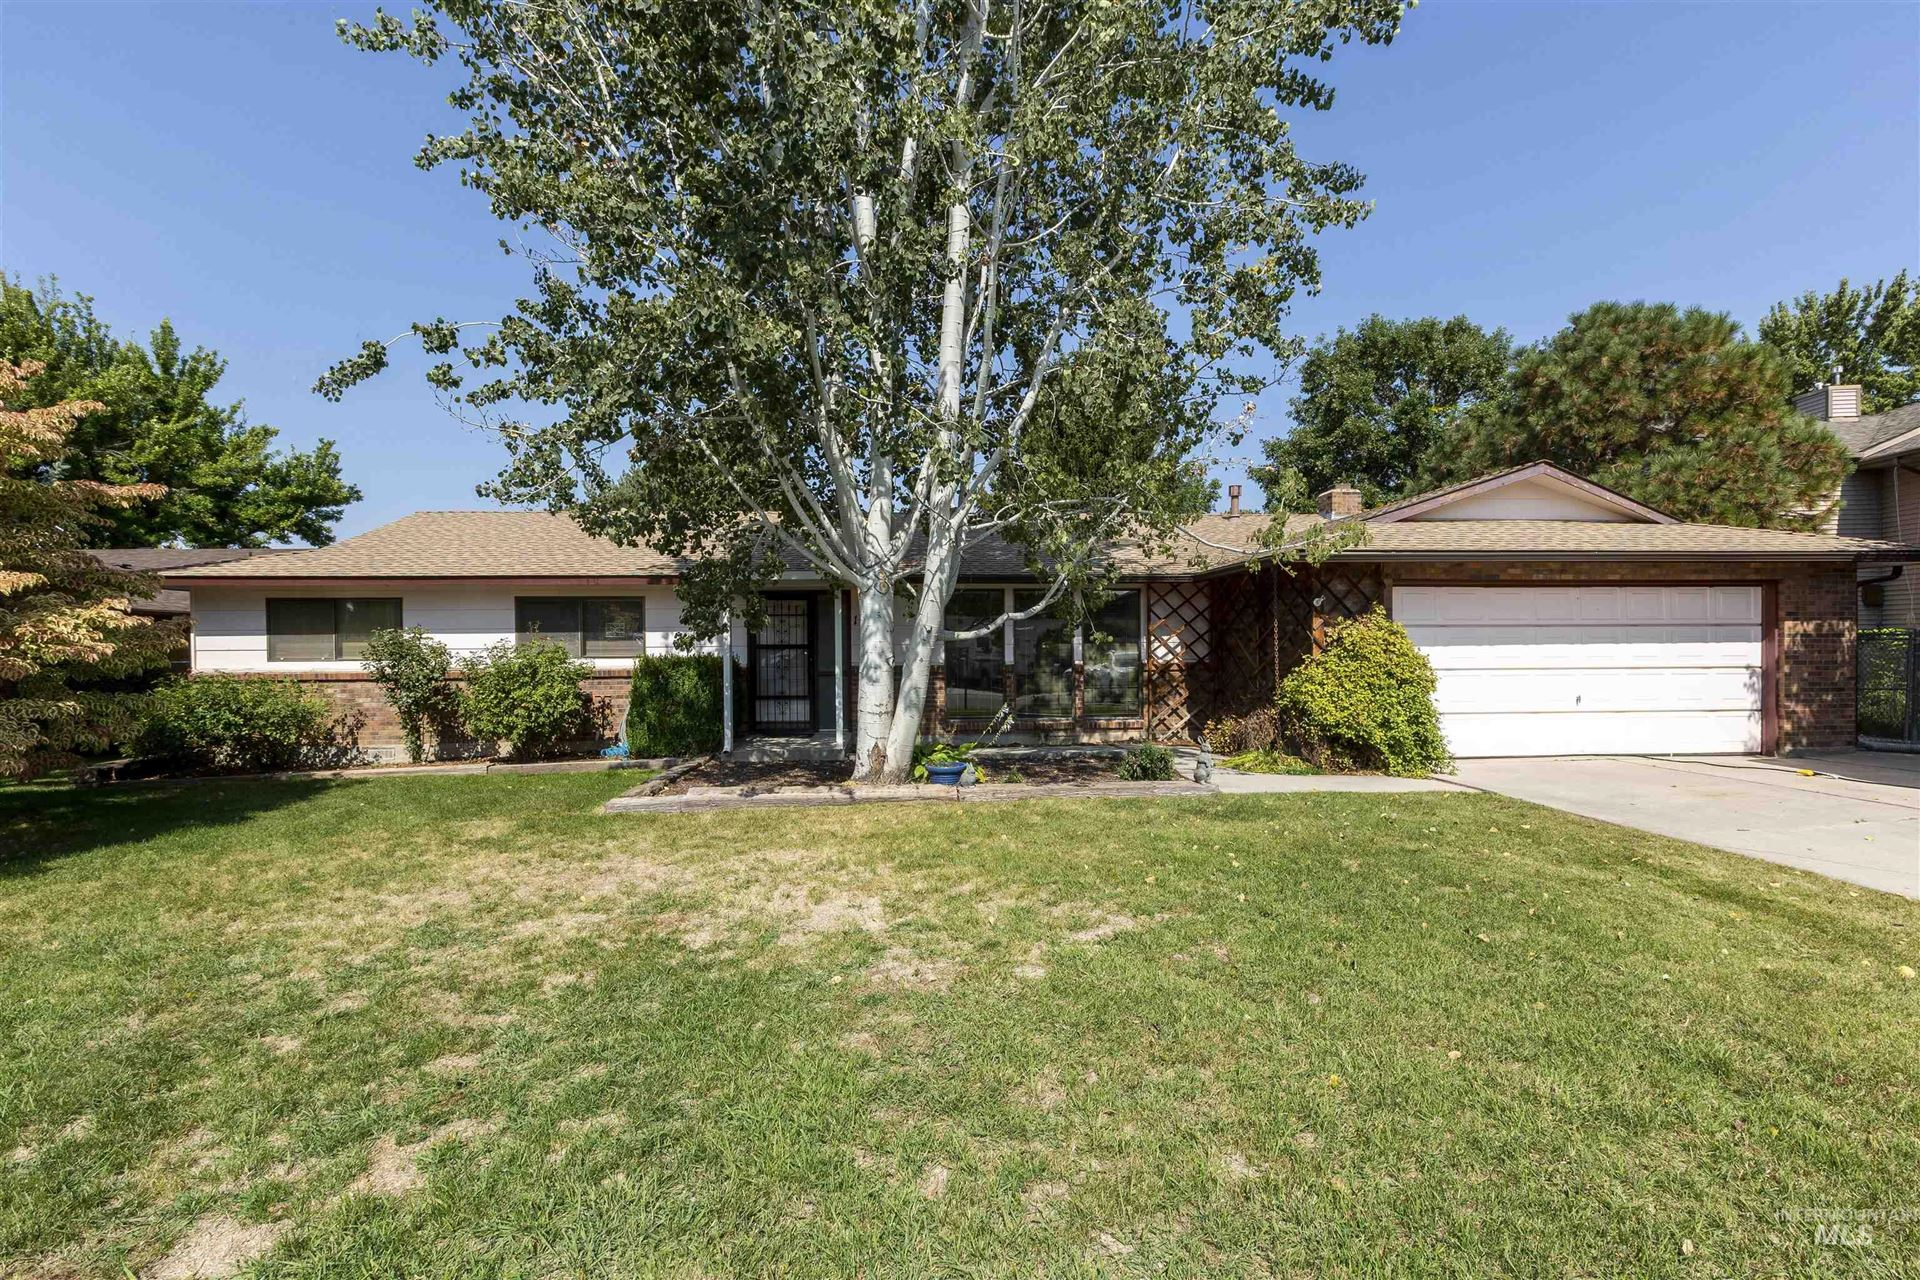 1262 S Linda Vista, Boise, ID 83709-0000 - MLS#: 98819807